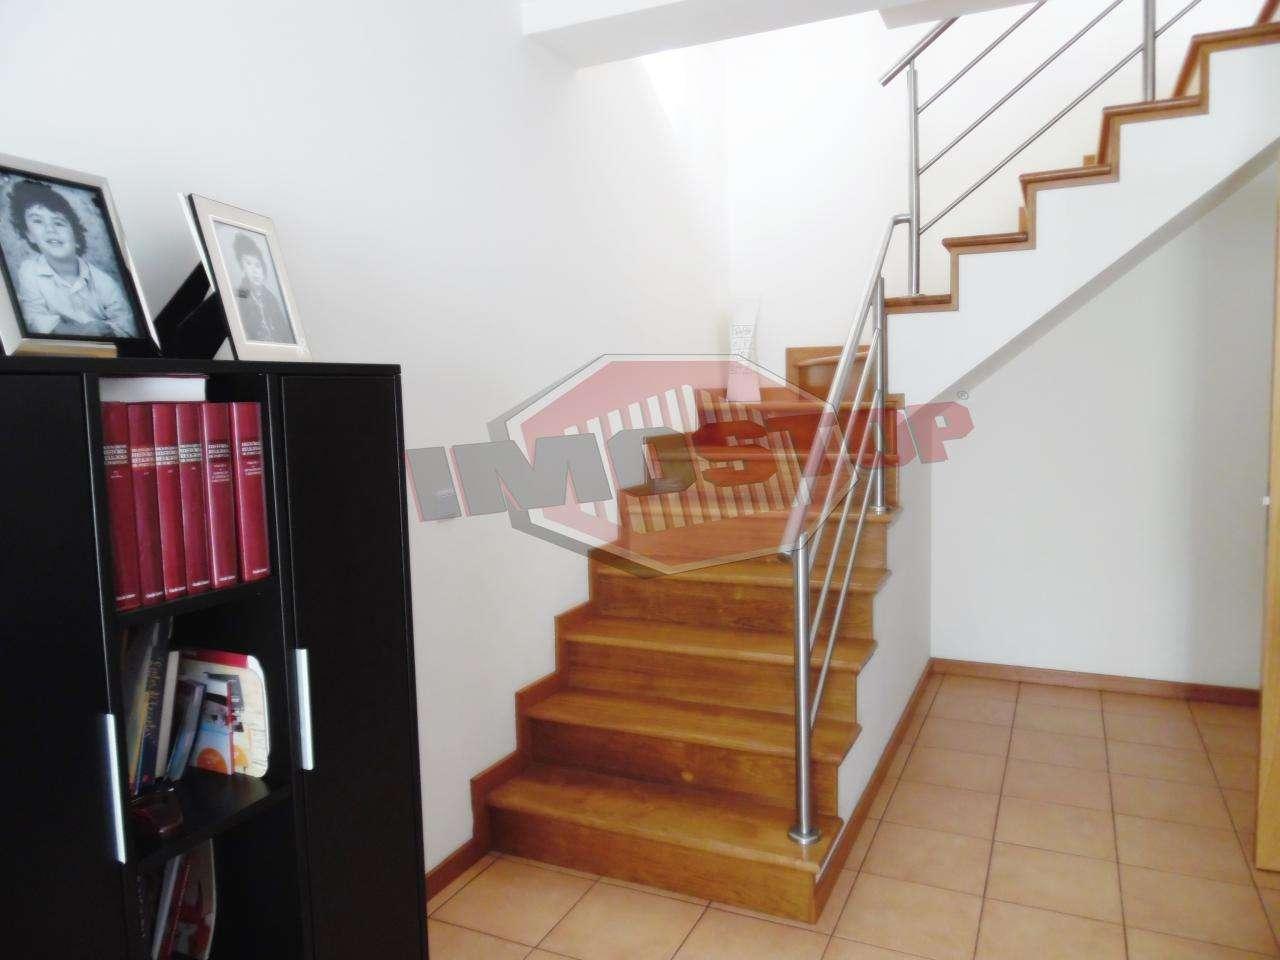 Apartamento para comprar, Oiã, Oliveira do Bairro, Aveiro - Foto 5